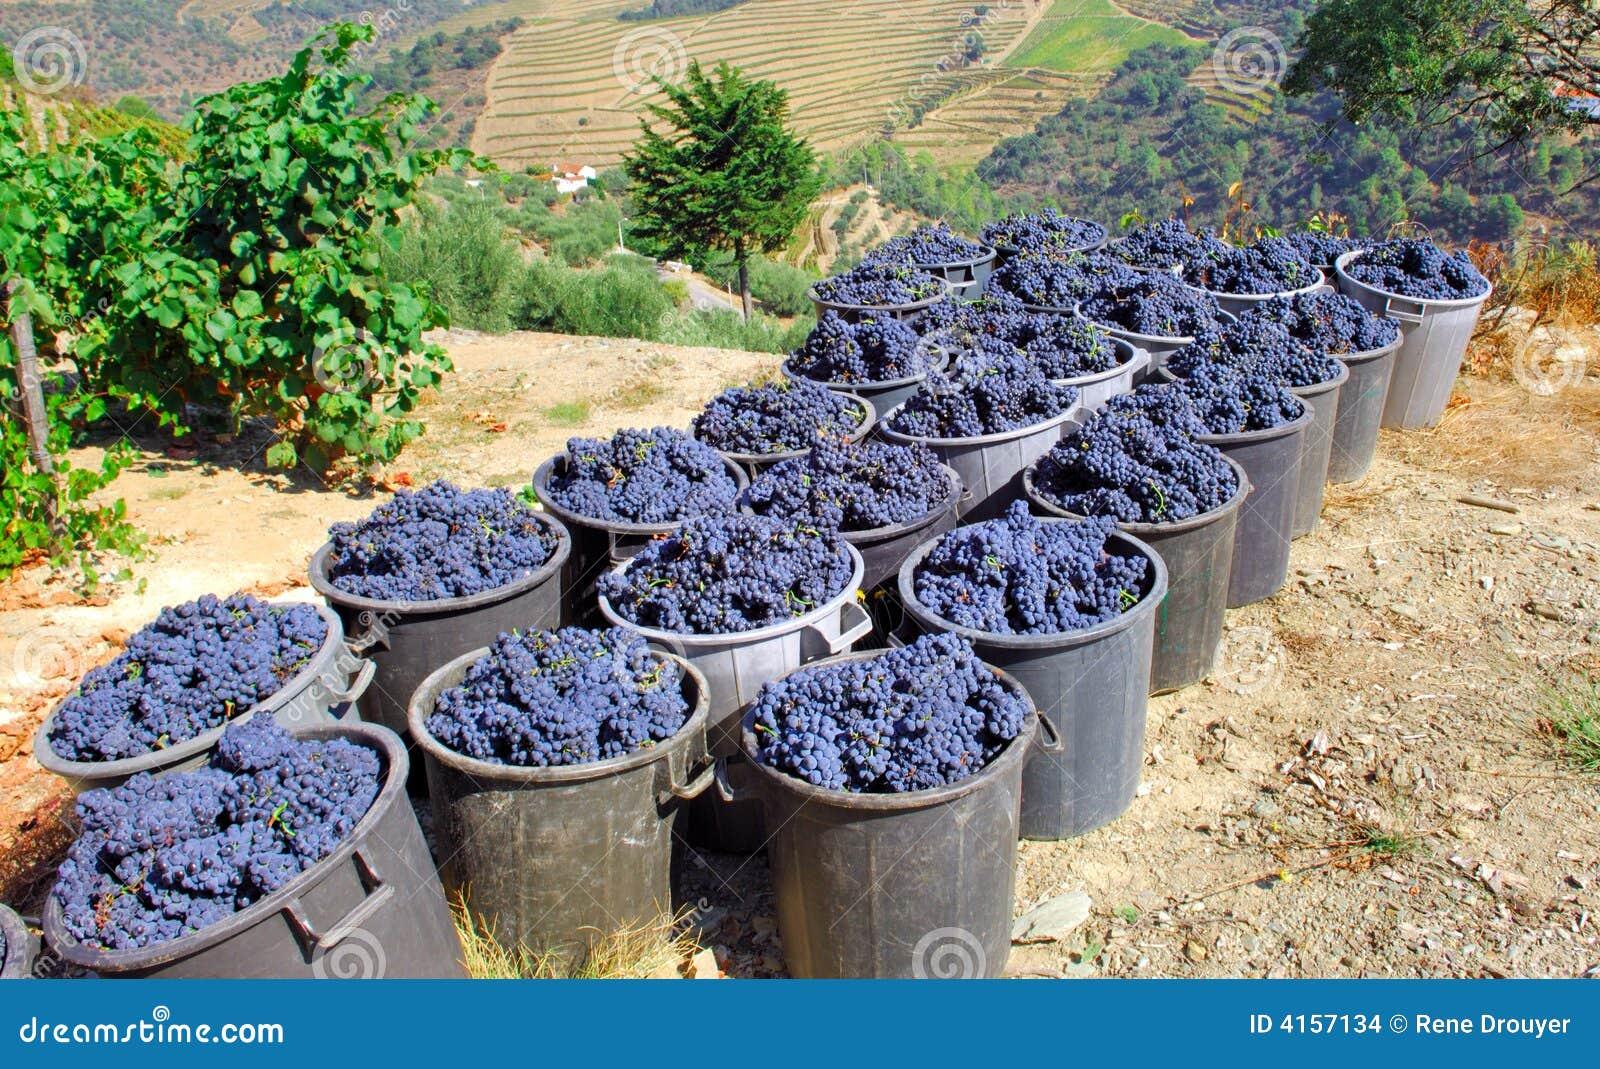 Portugal, Douro valley: Grapes